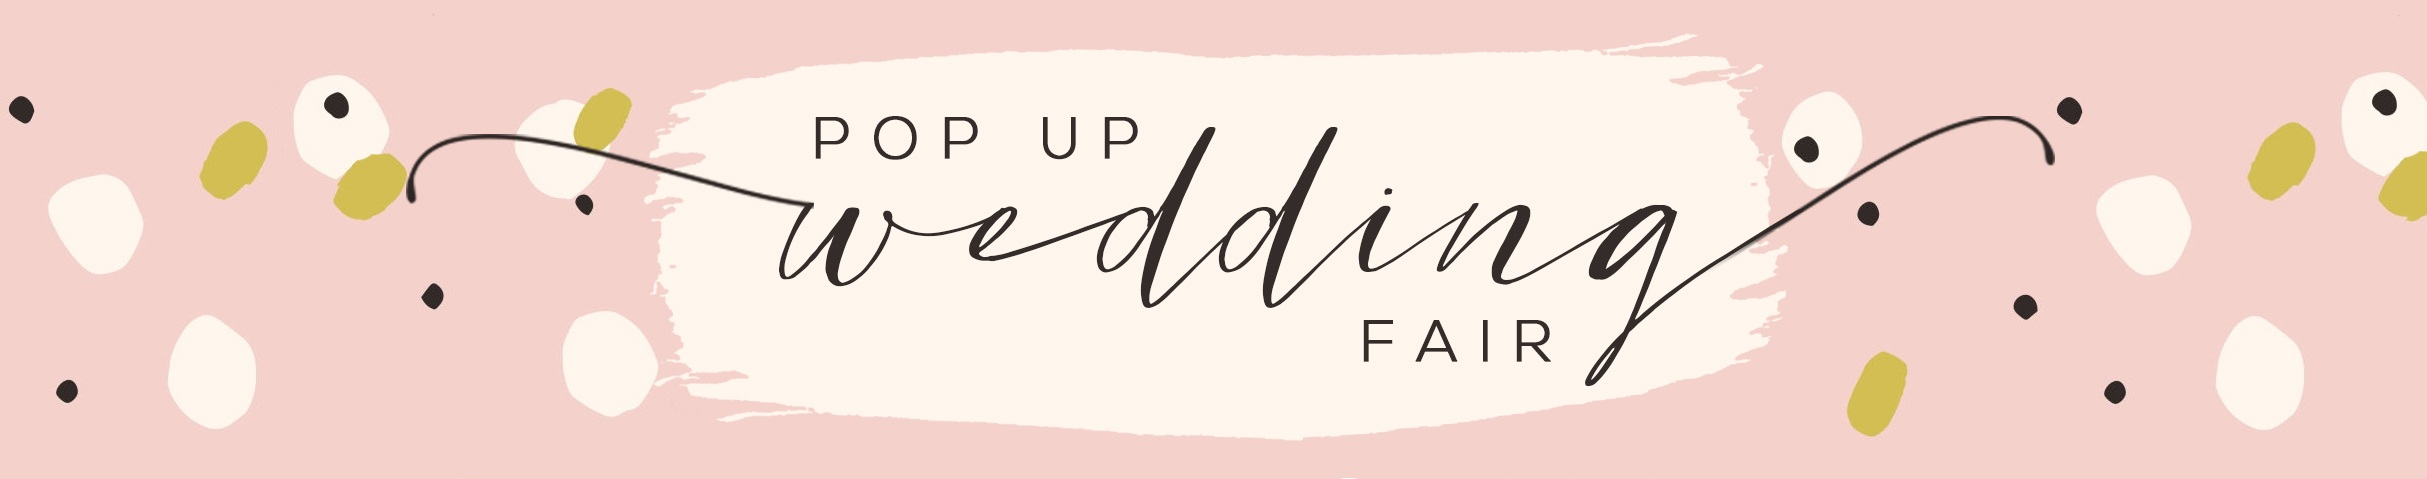 2019+wedding+fair+Web+Header.jpg